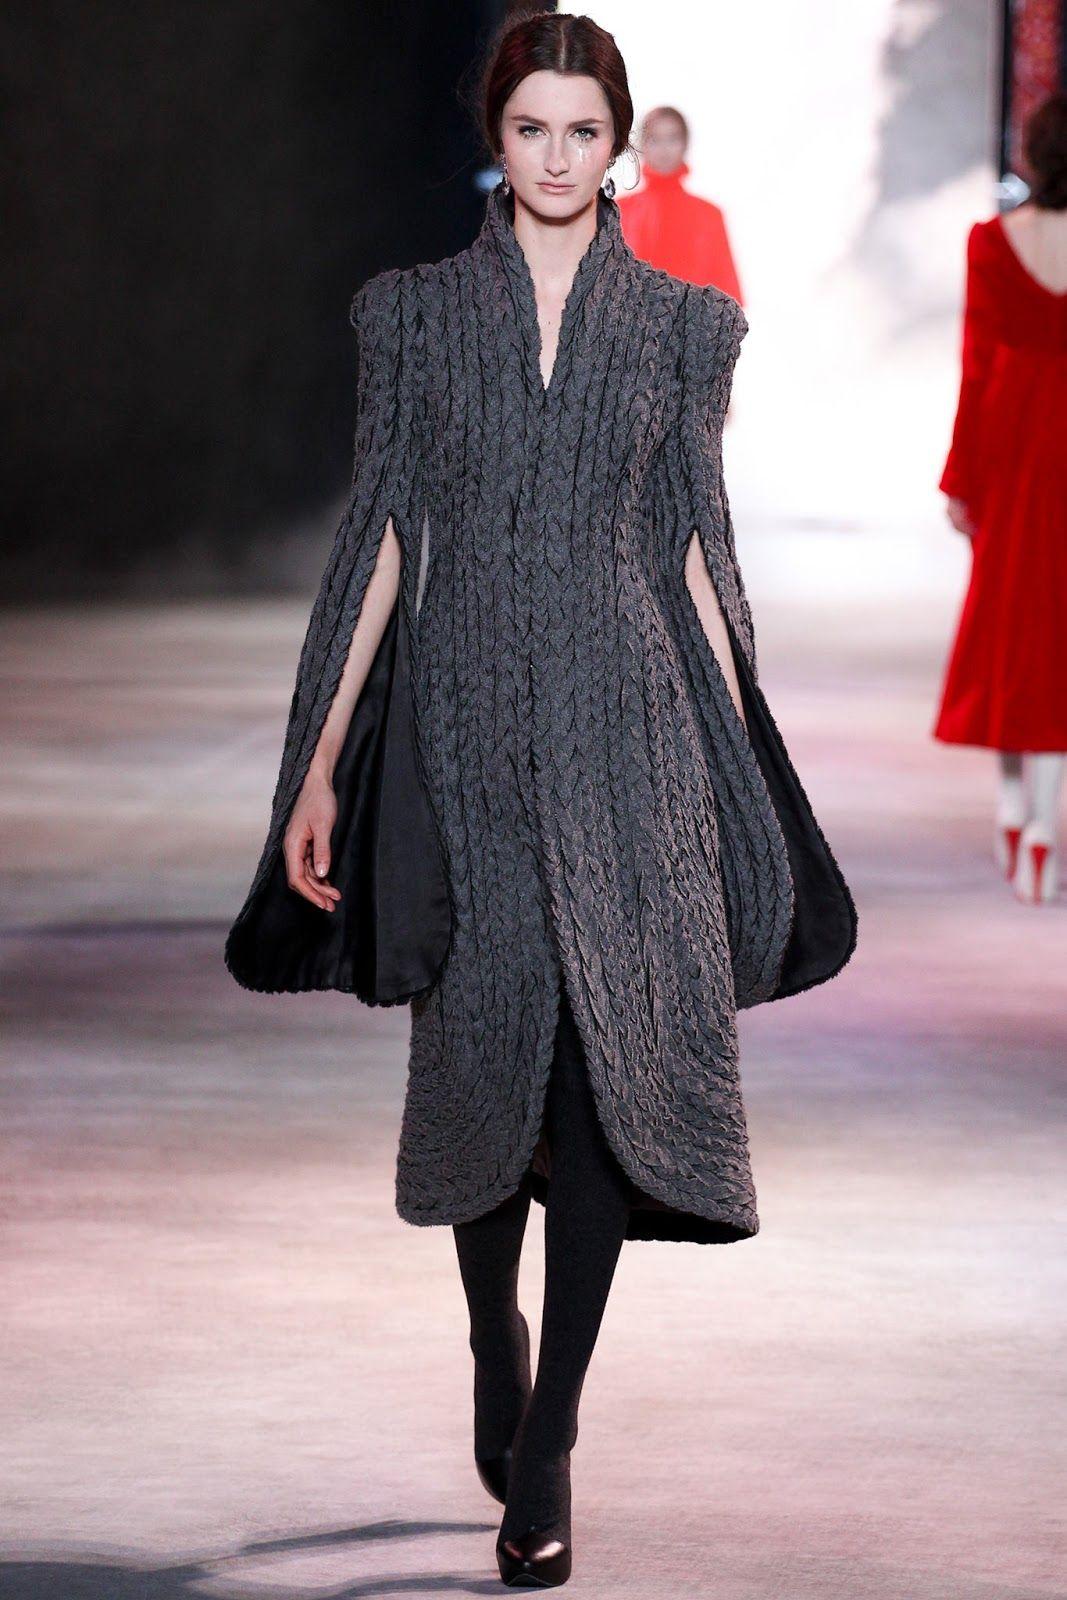 ulyana sergeenko coutue fall 2013 | visual optimism; fashion editorials, shows, campaigns & more!